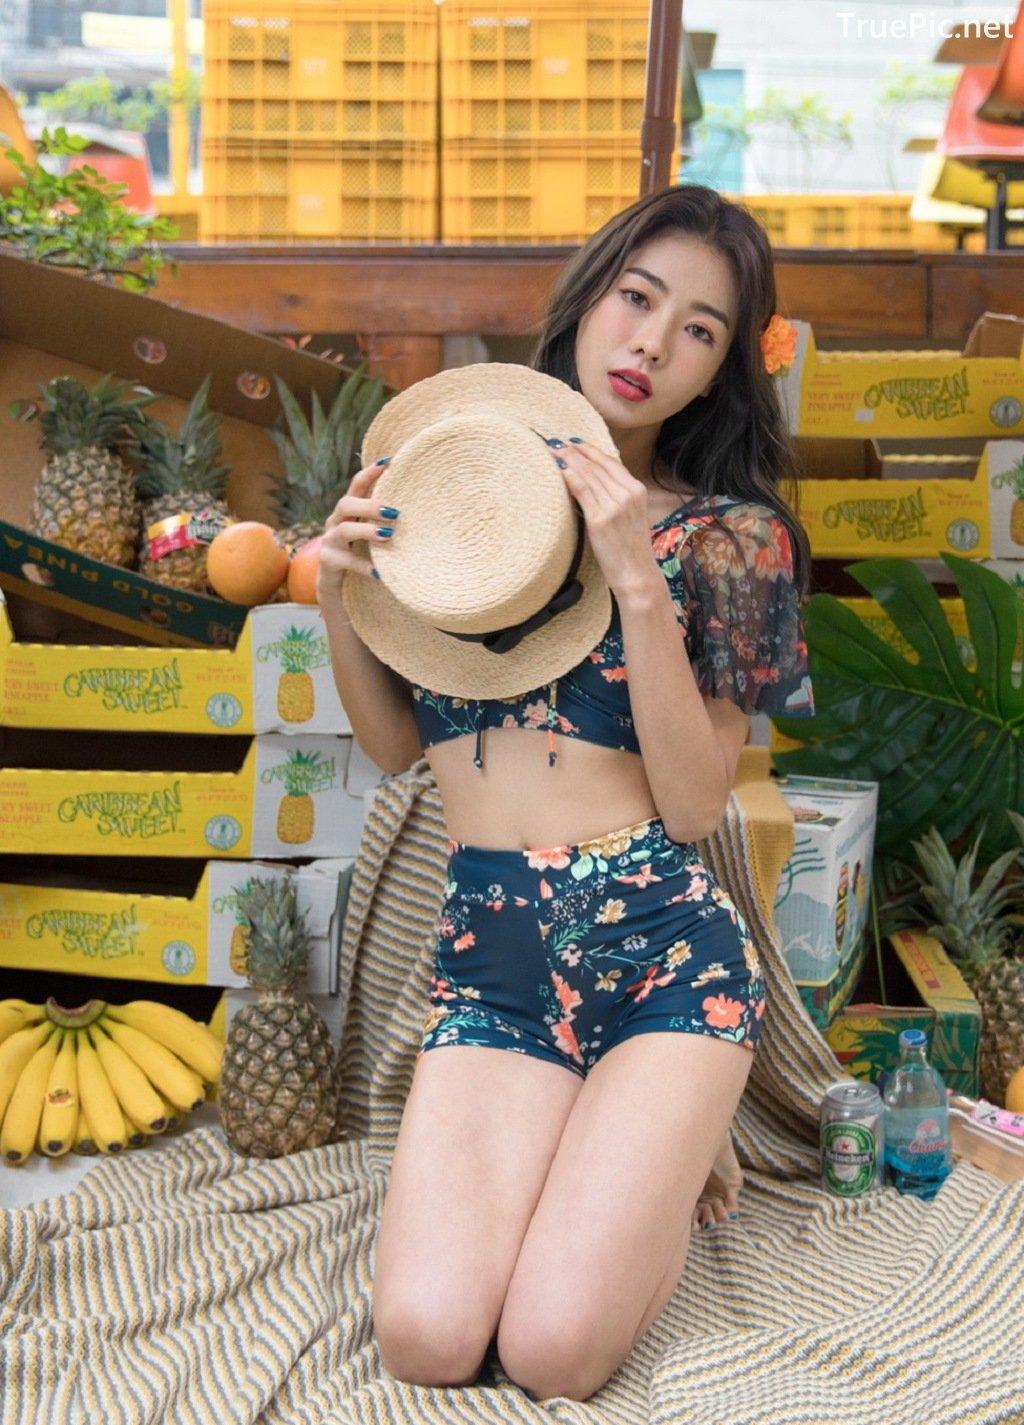 Image-An-Seo-Rin-Flower-and-Butterfly-Bikini-Korean-Model-Fashion-TruePic.net- Picture-4